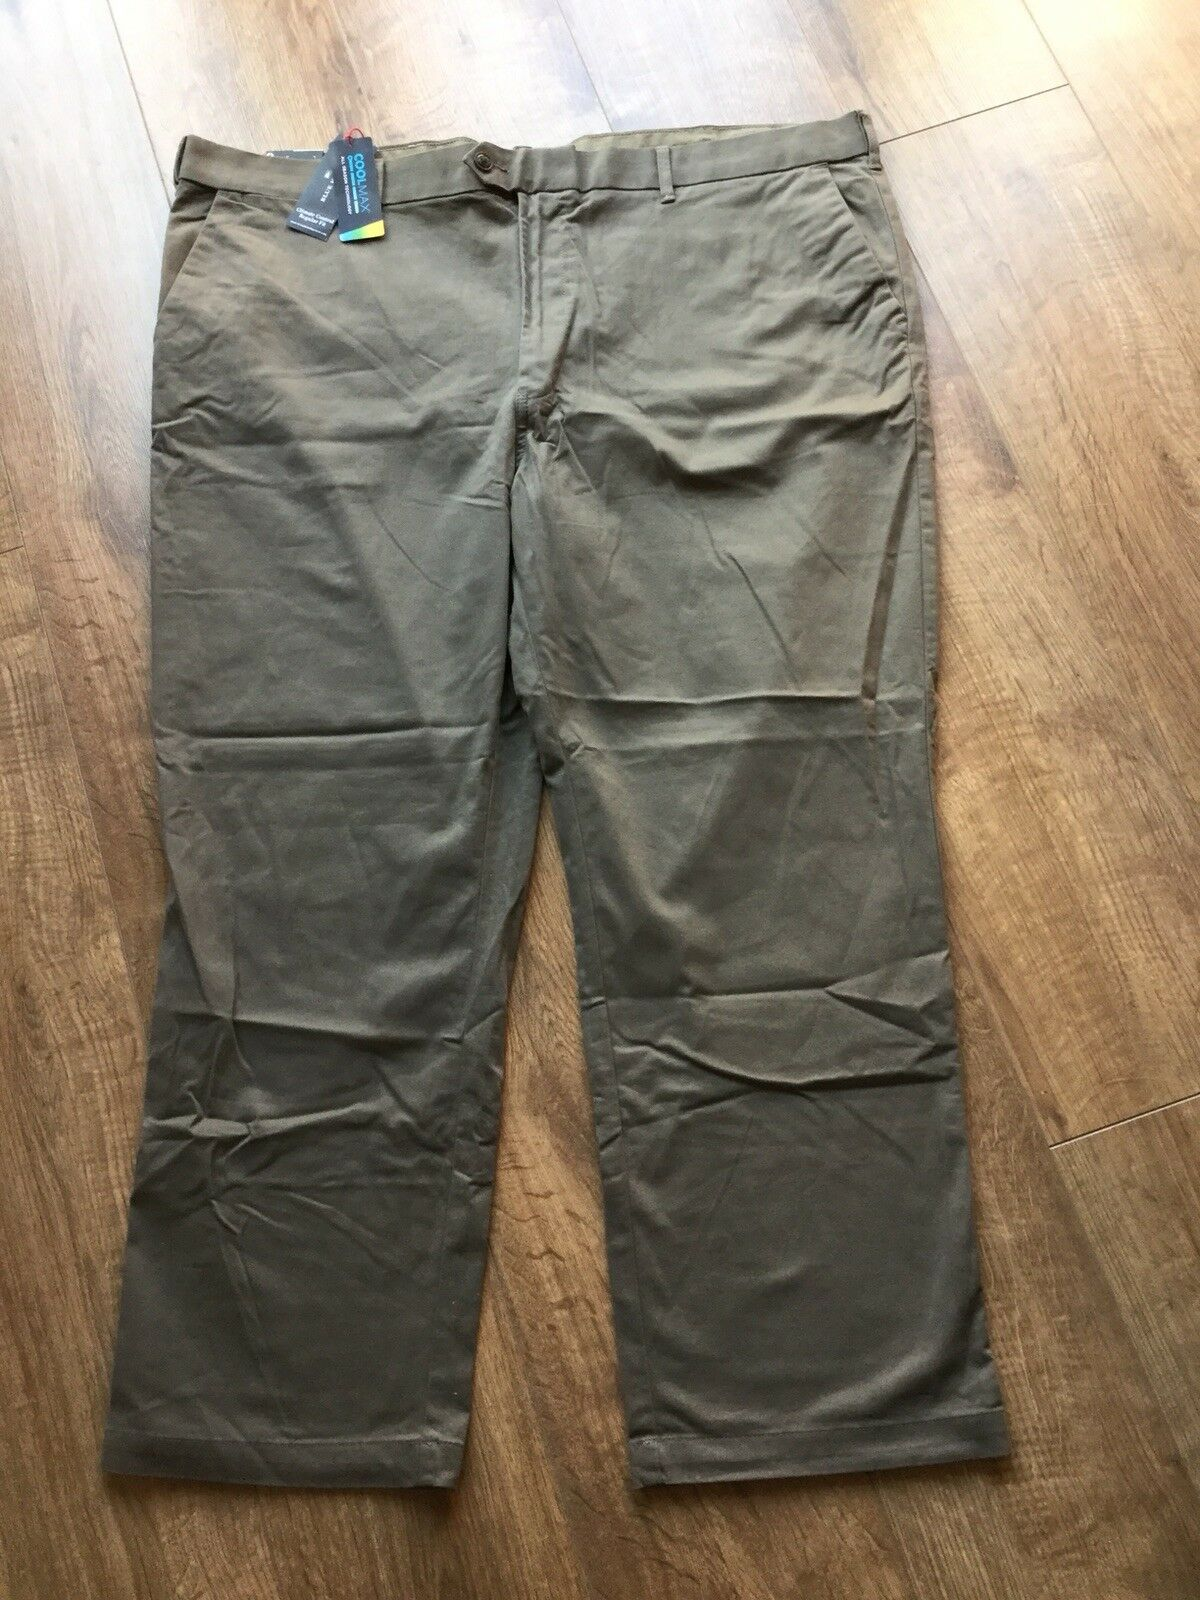 "BNWT Mens M&S bluee Harbour Trousers Size 48"" Waist   29"" Inside Leg - RRP .50"